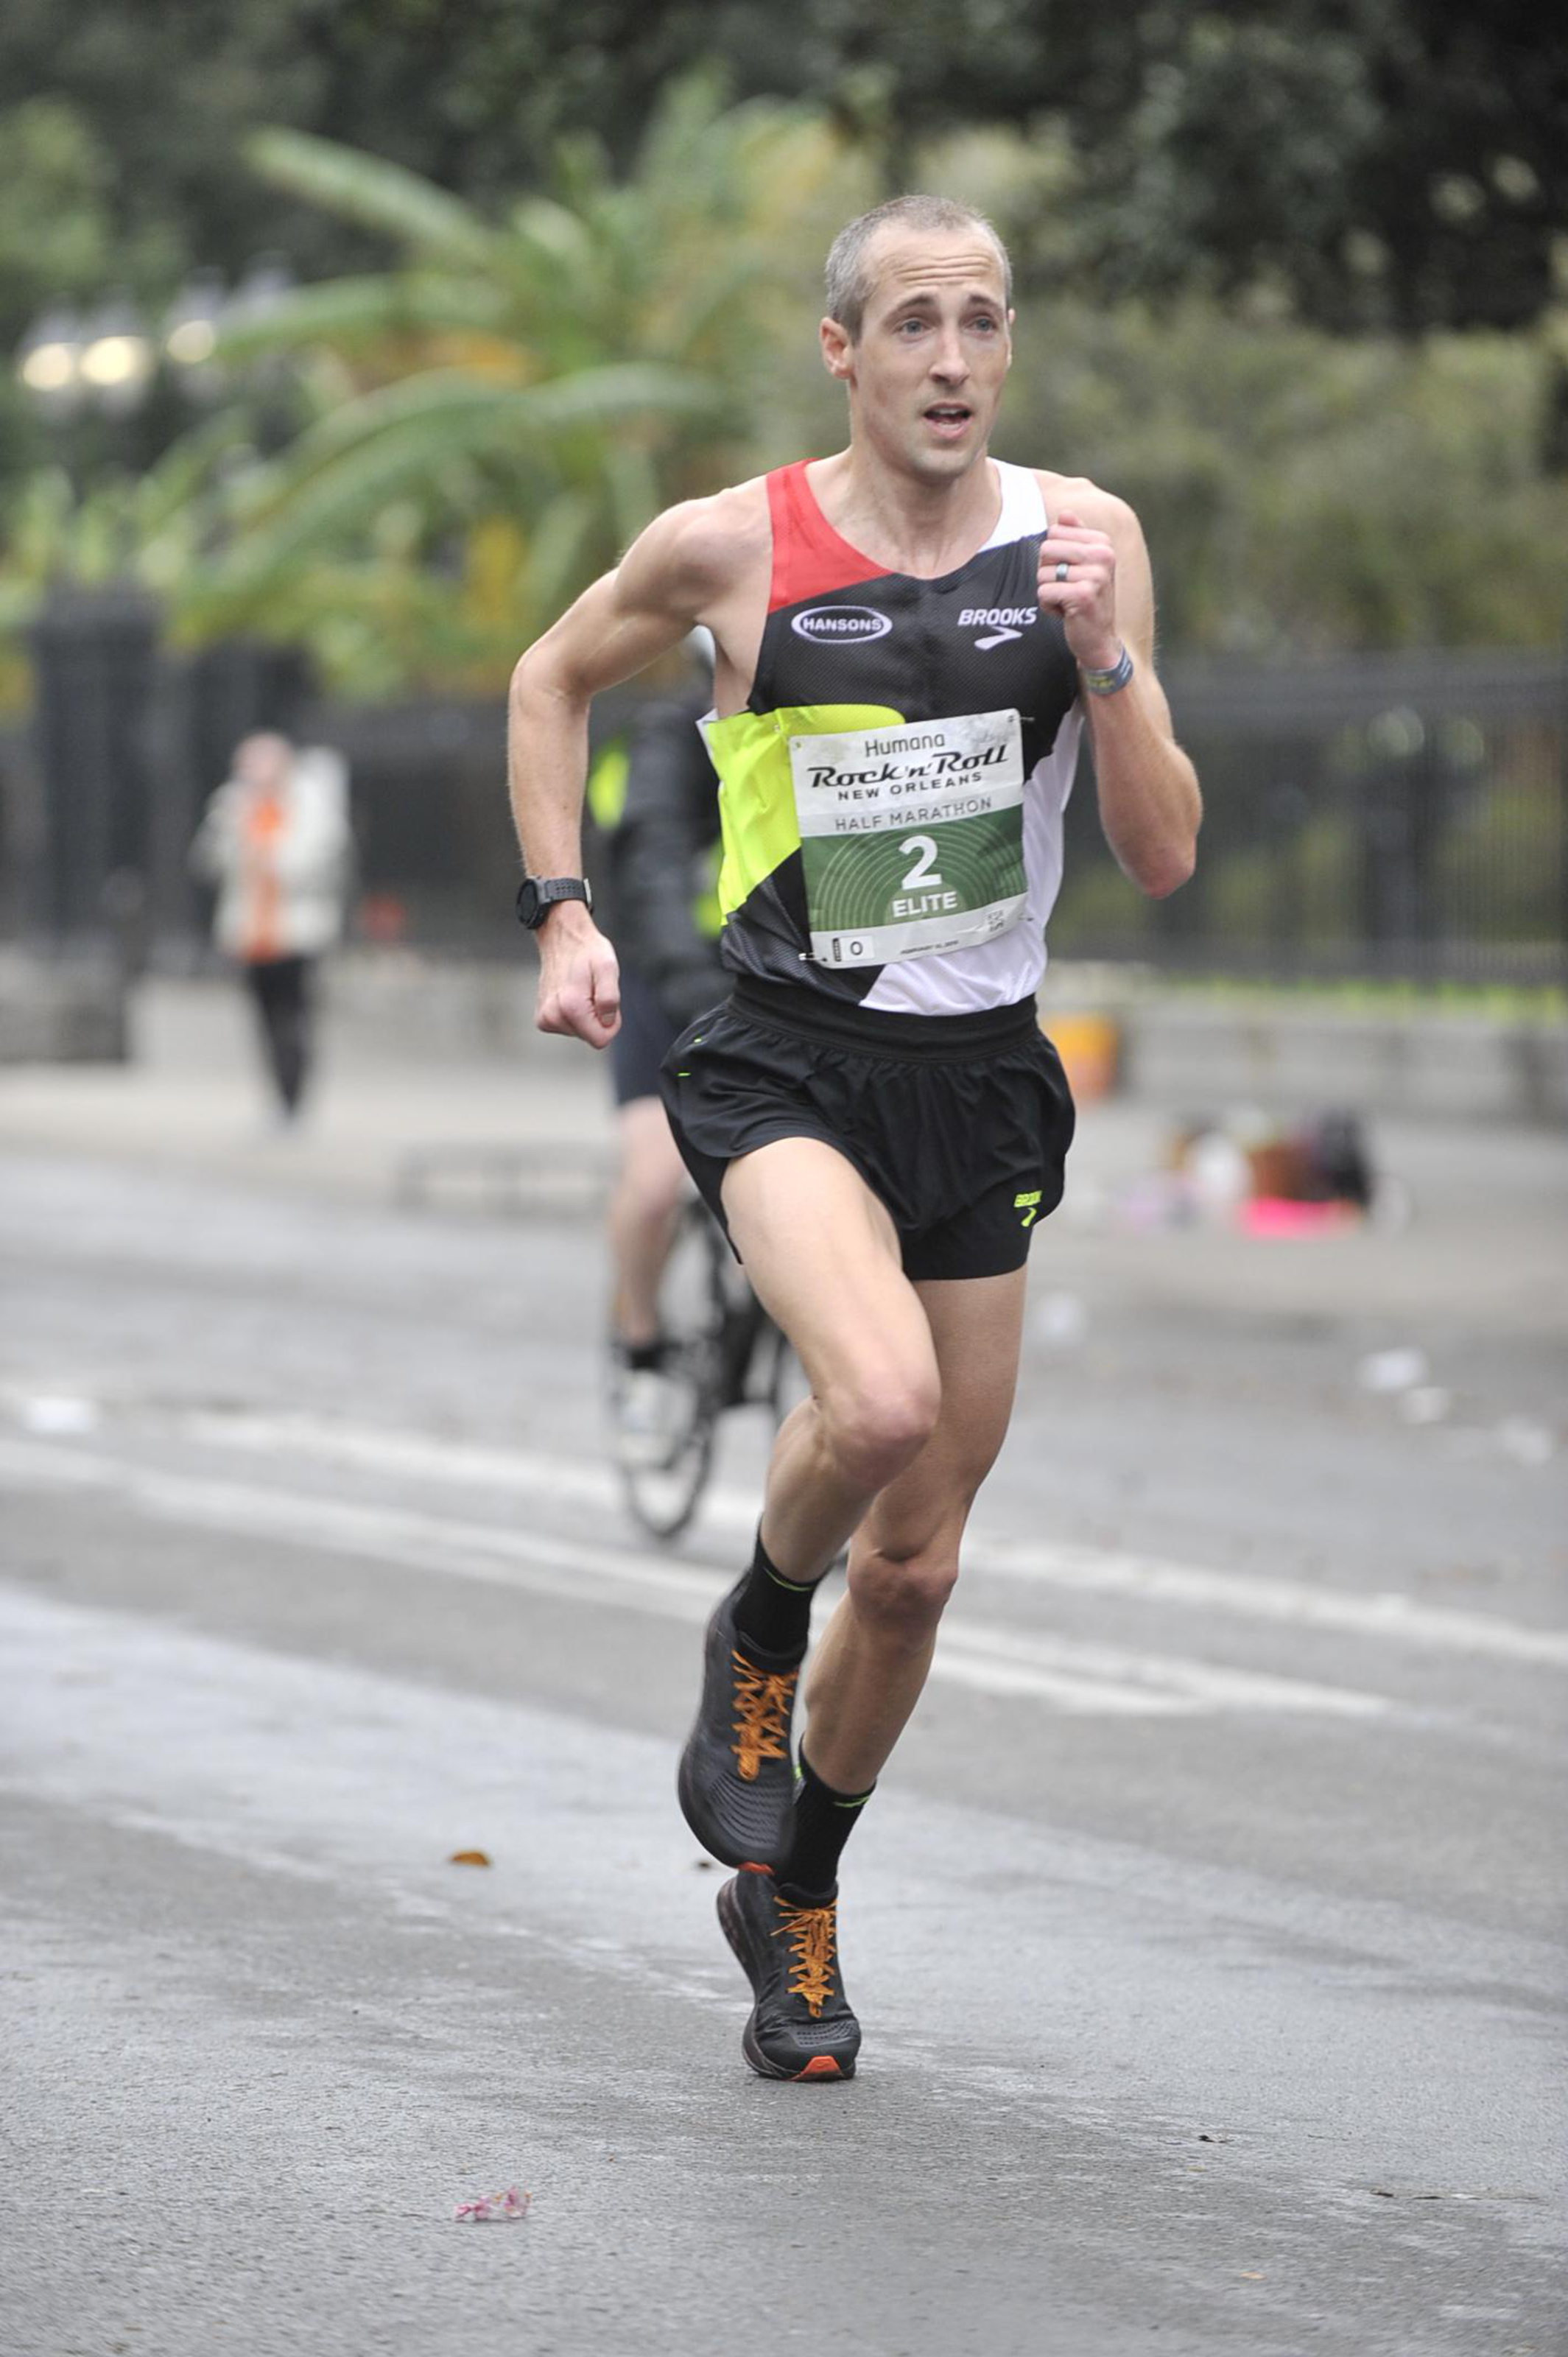 Hanson half marathon plan review